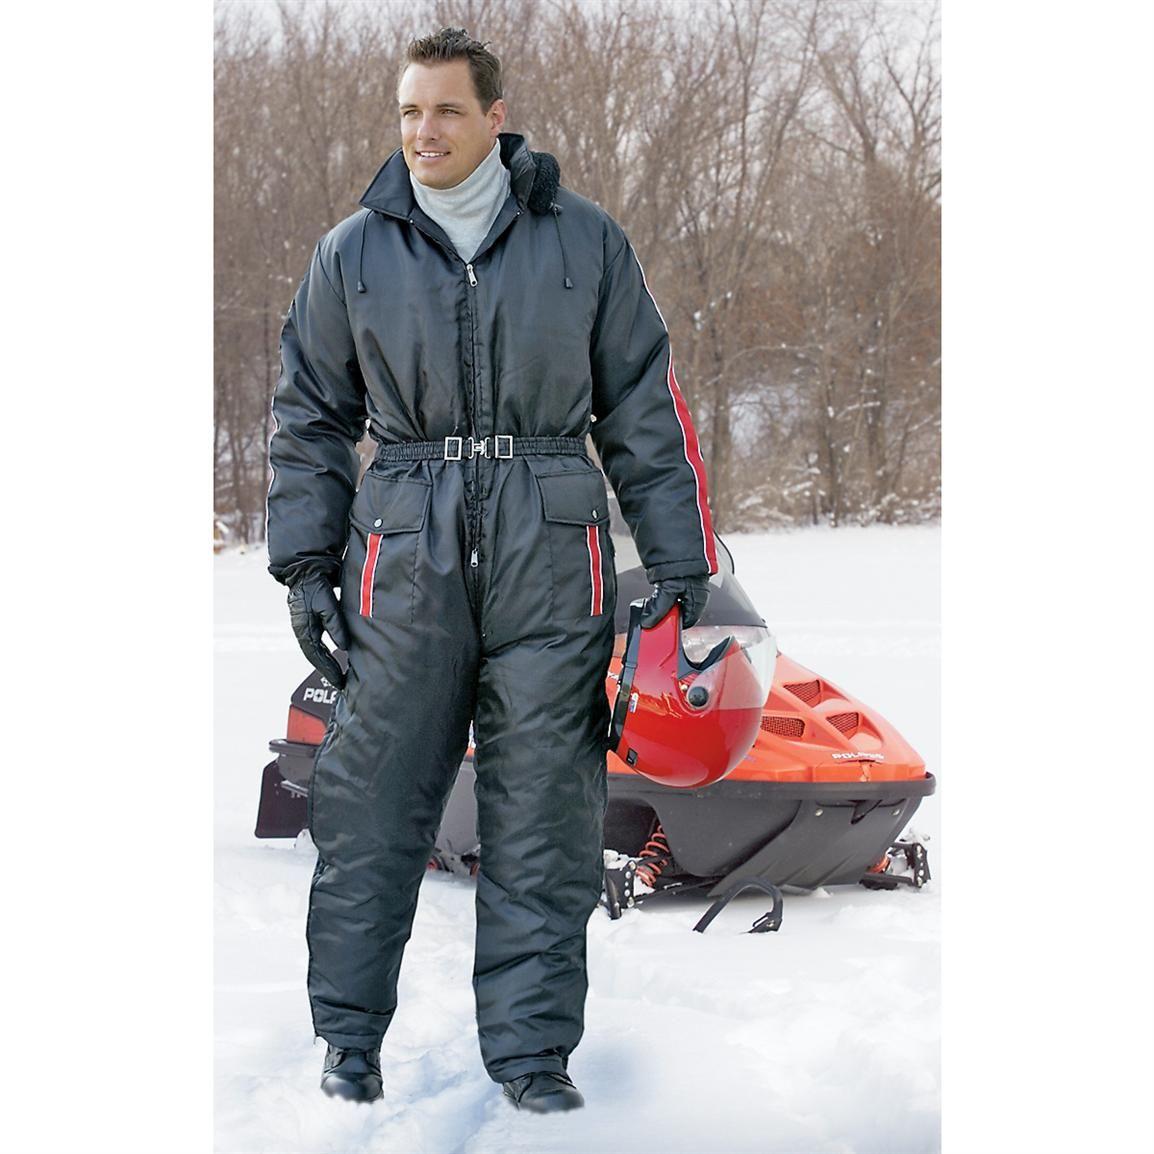 Snowsuit For Men Home Clothing Men S Clothing